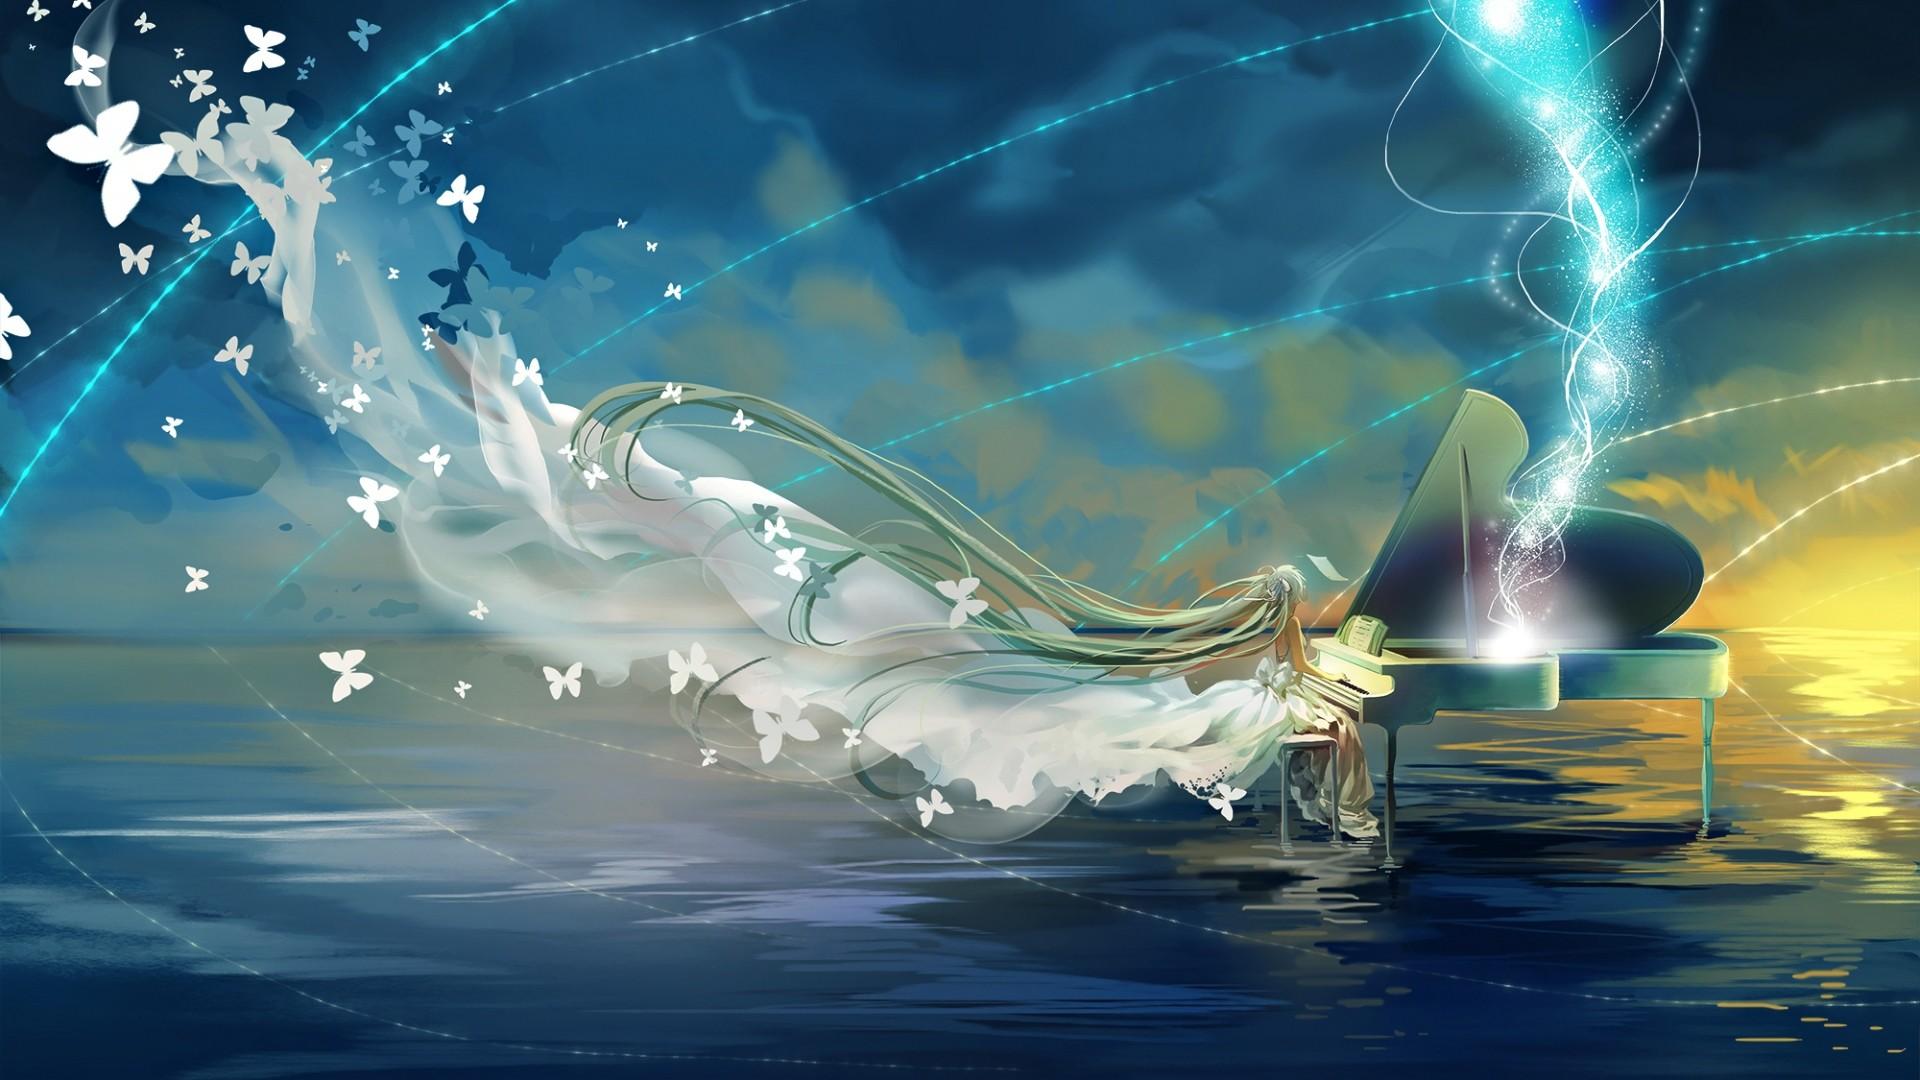 Anime Wallpaper Aoki Hagane no Arpeggio, Kisara Tendo, Black  Bullet, sword | HD Anime Wallpapers | Pinterest | Anime wallpaper 1920×1080,  …